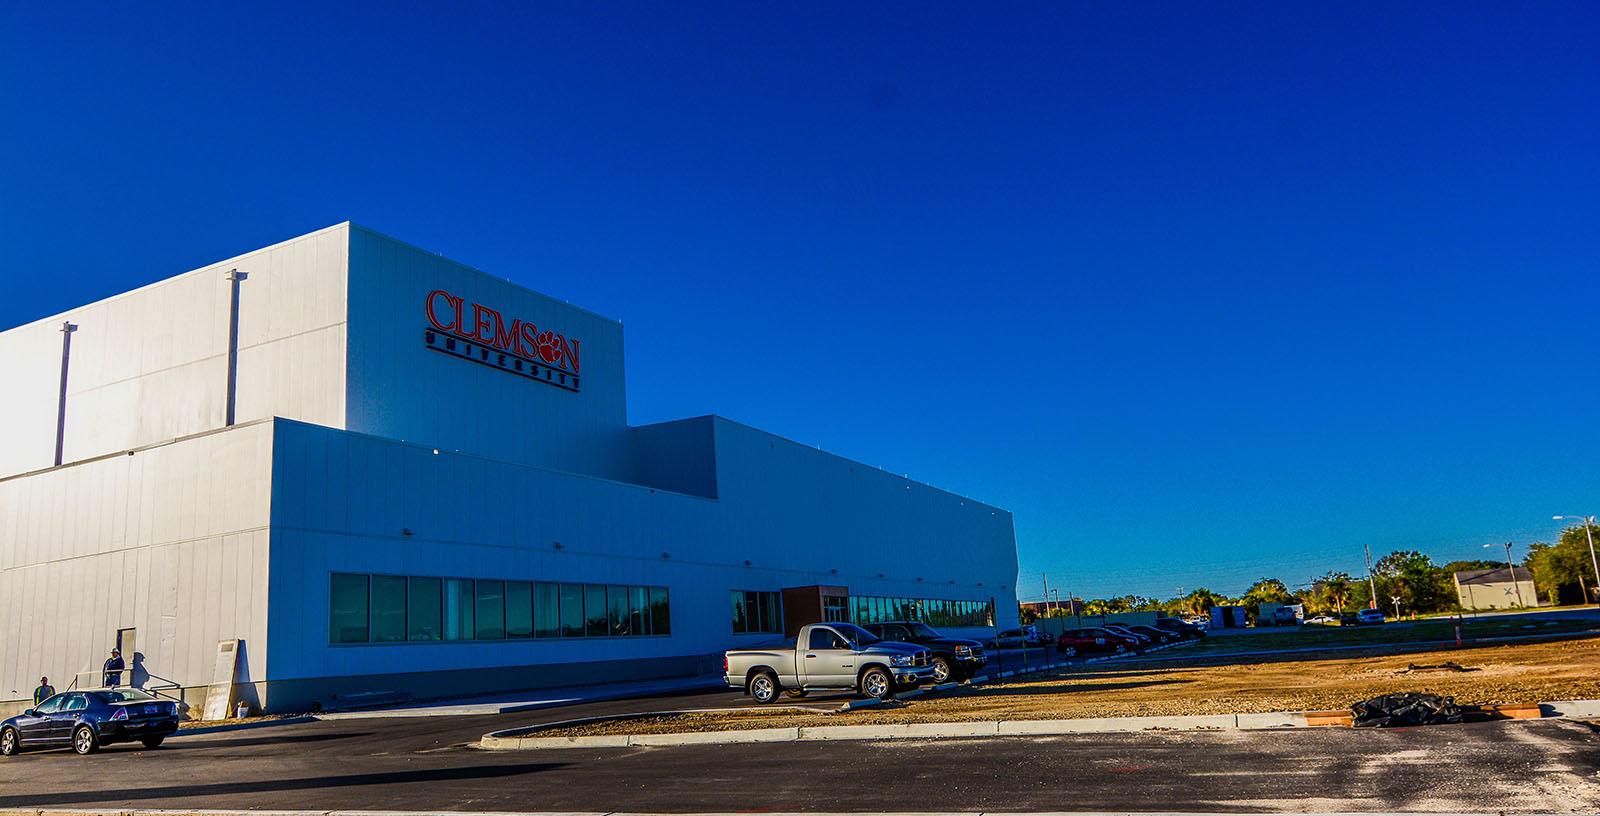 CLEMSON_Windturbine_drivetrain_test_facility_building_USA_ADA_Idom__1_